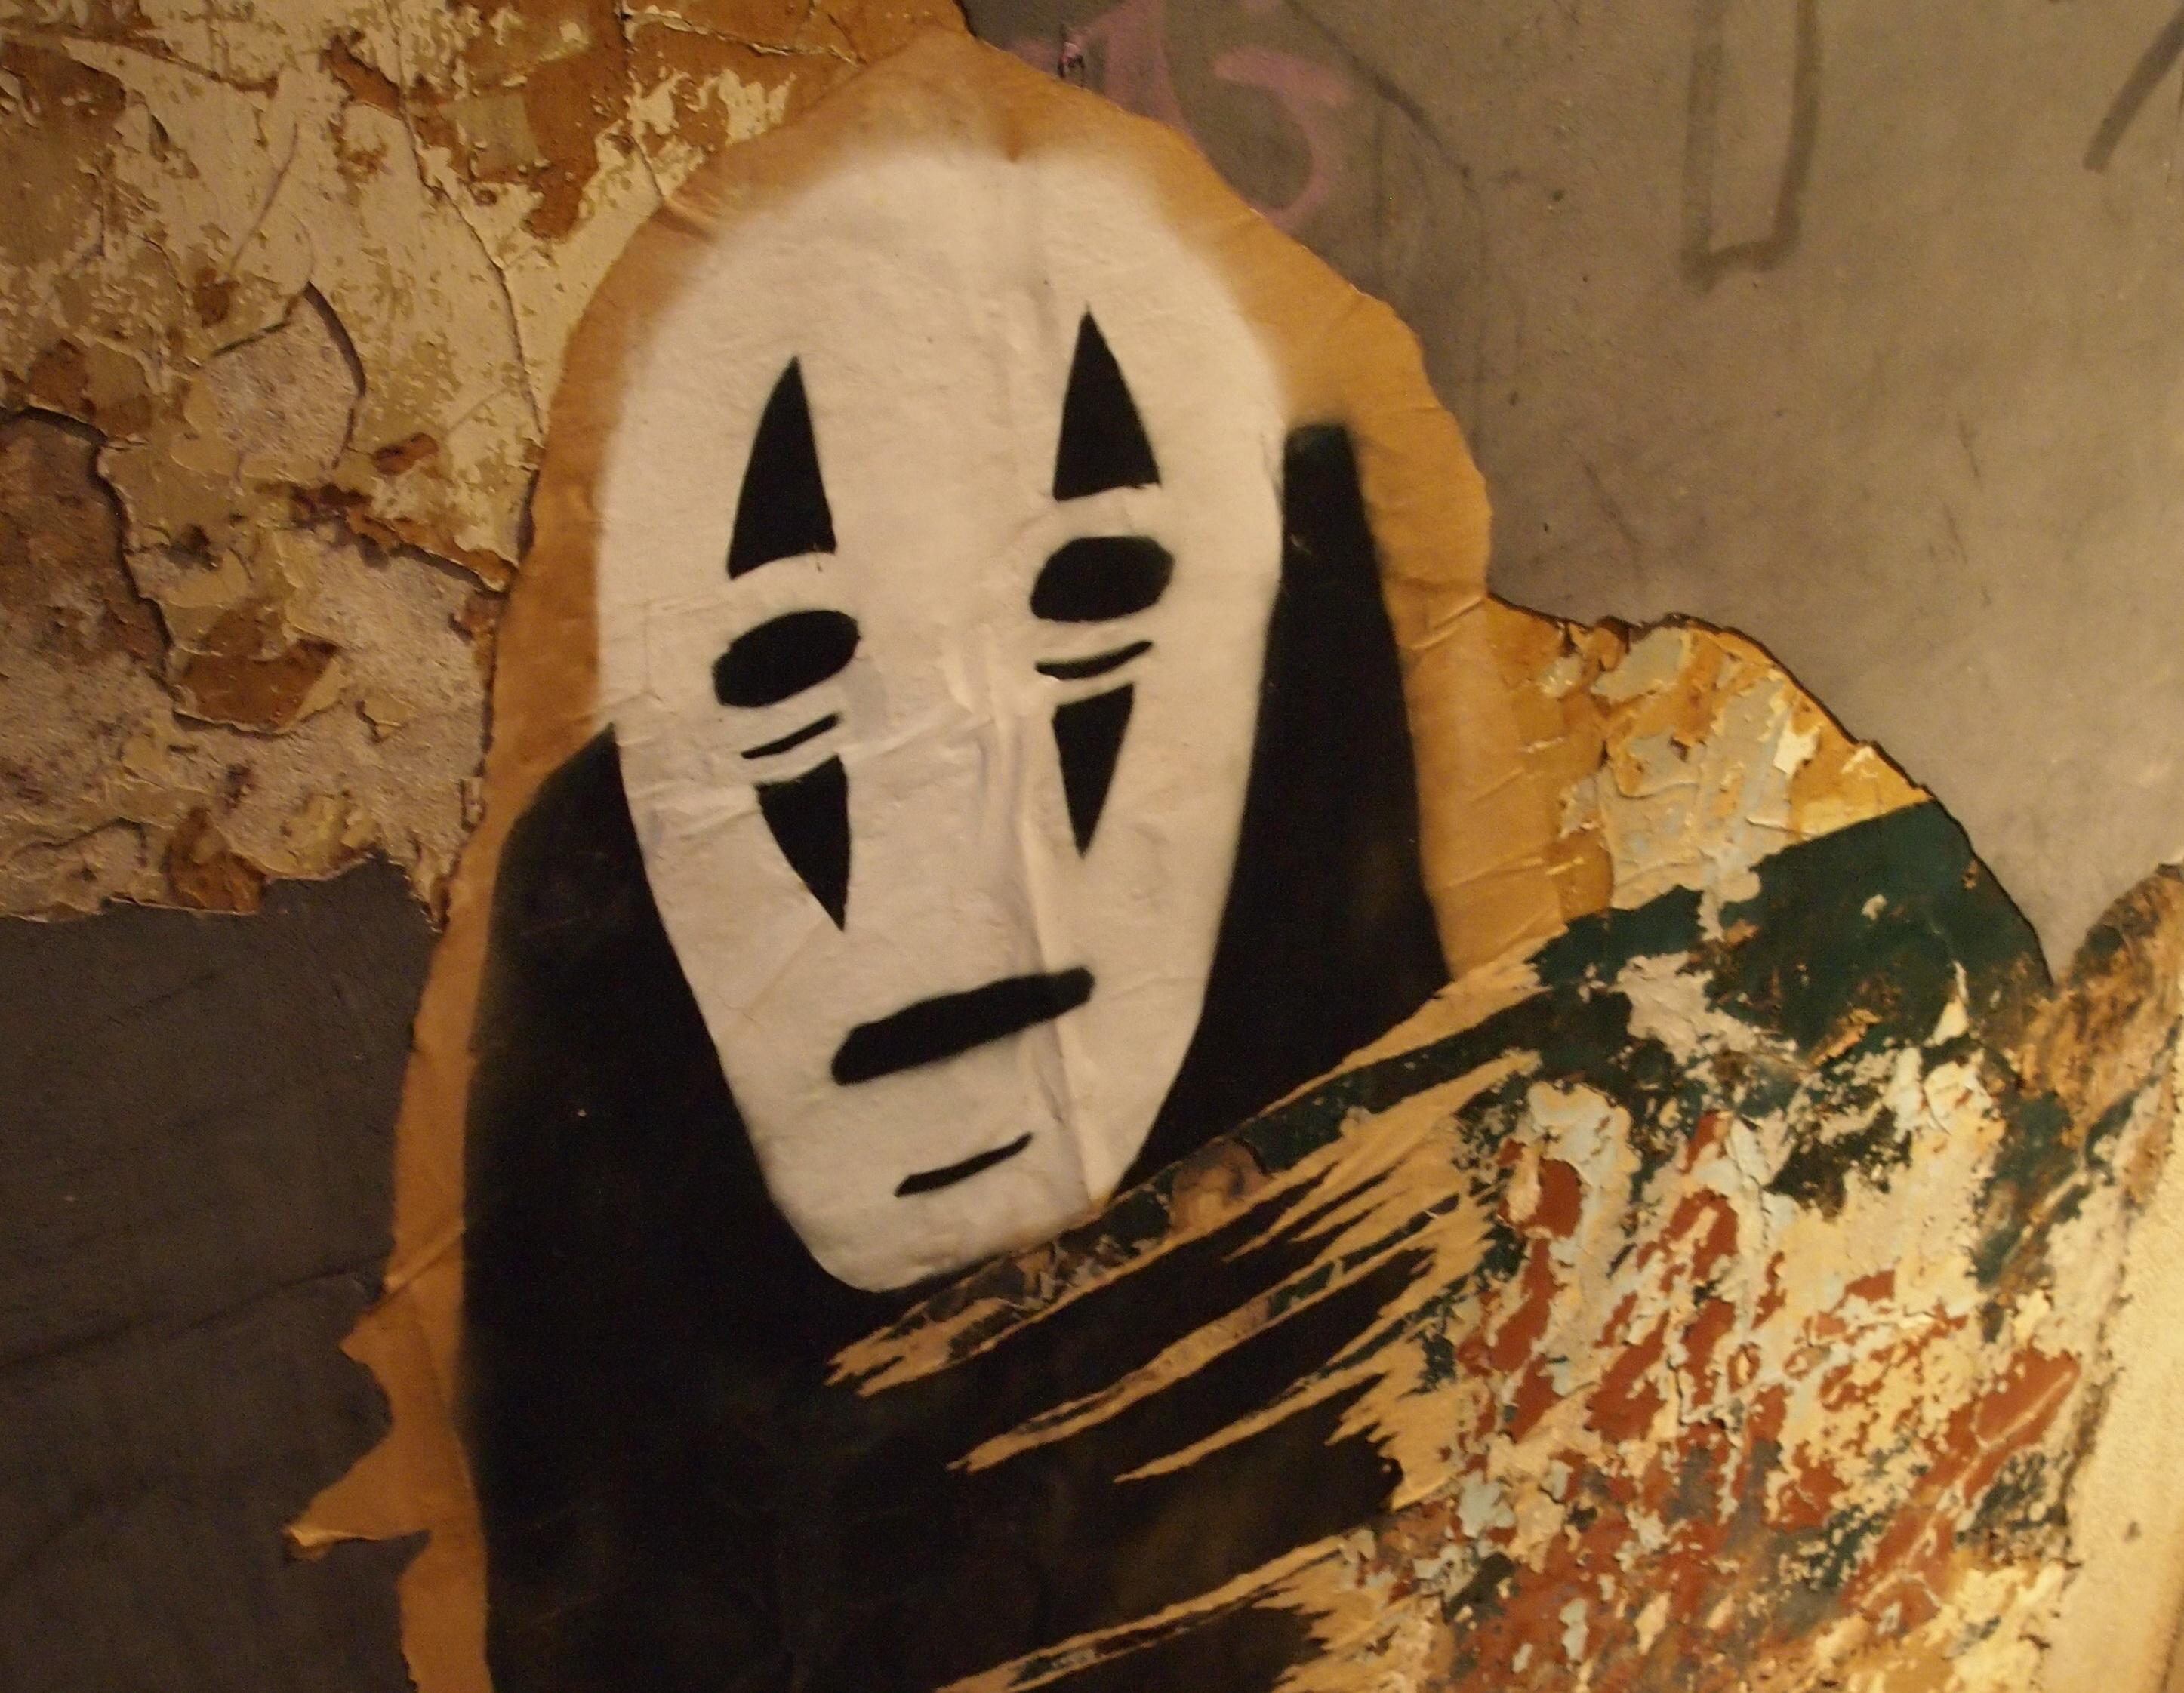 Gambar Dinding Lukisan Seni Urban Jepang Hantu Ukiran Gambar